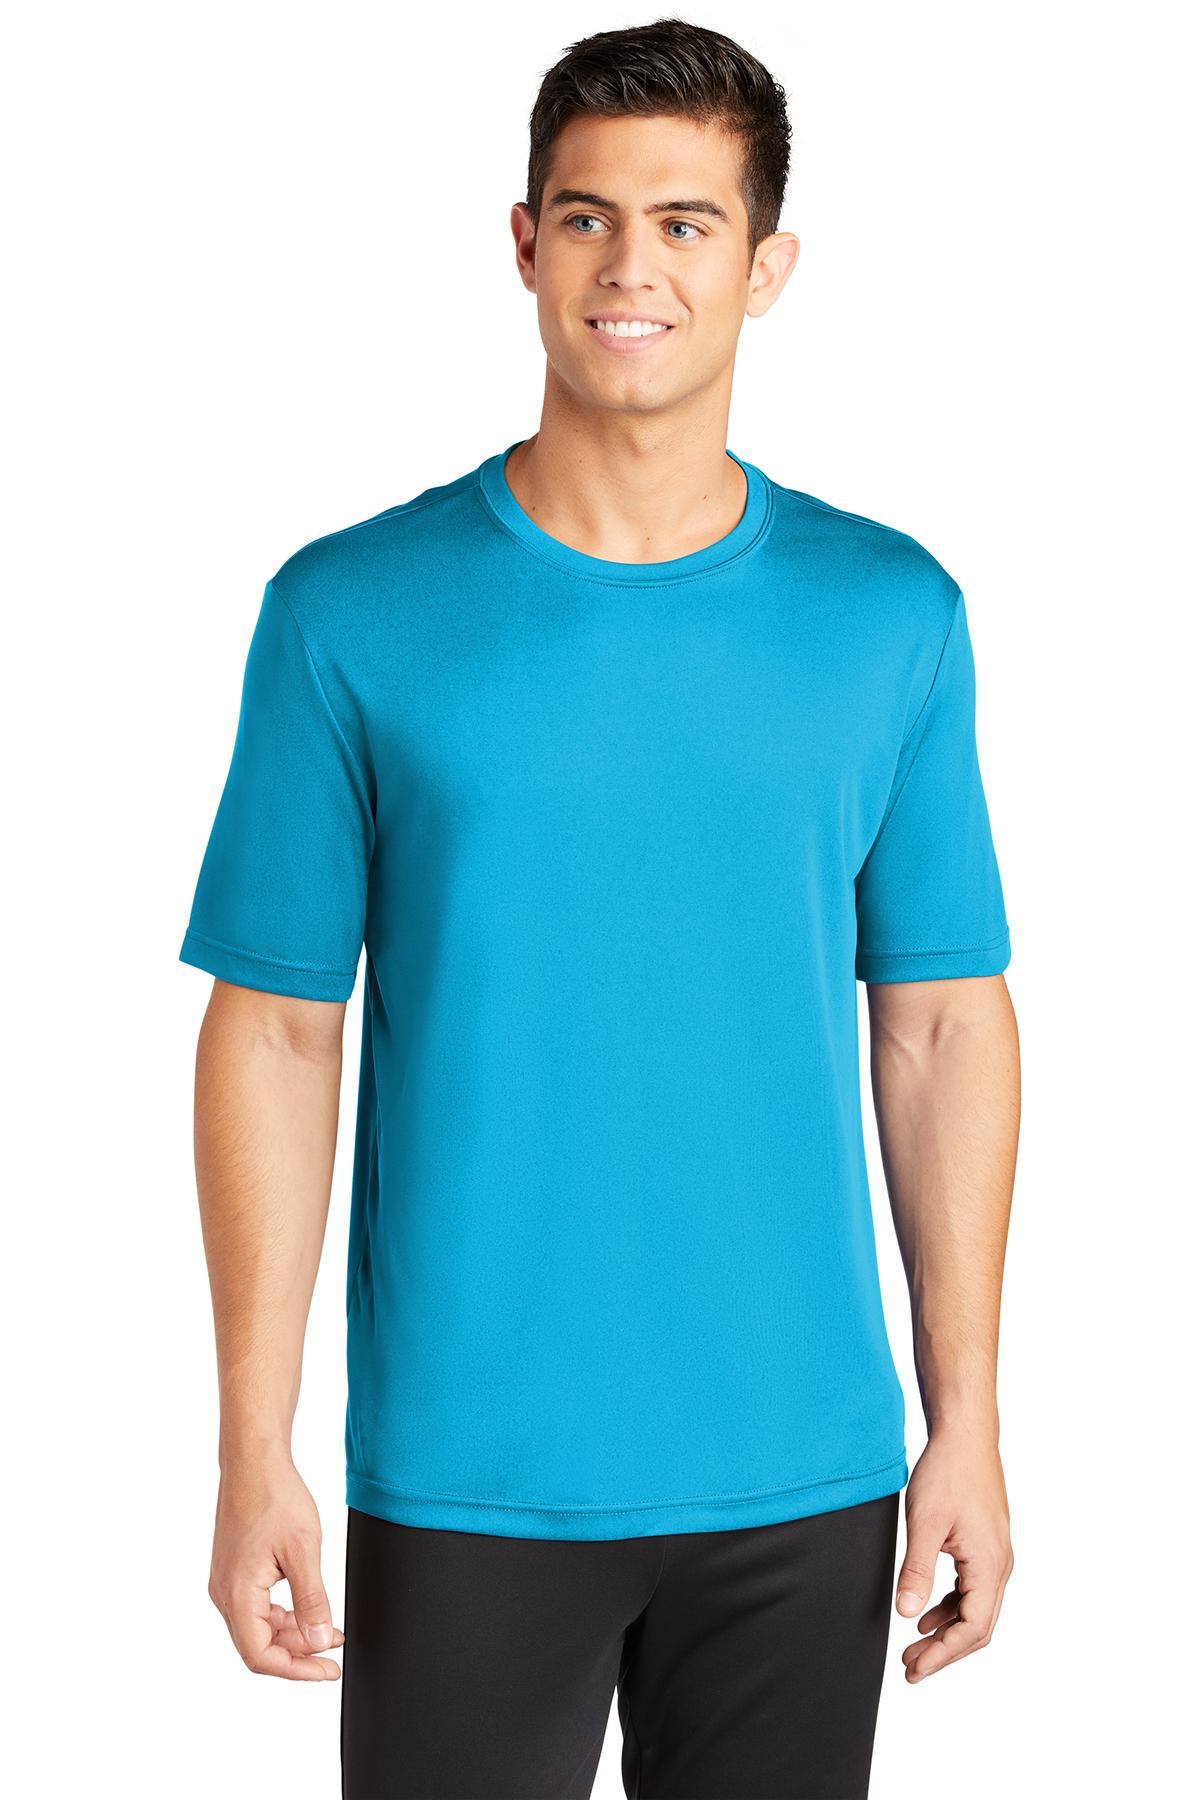 SWET Men's Short Sleeved Tech Shirt